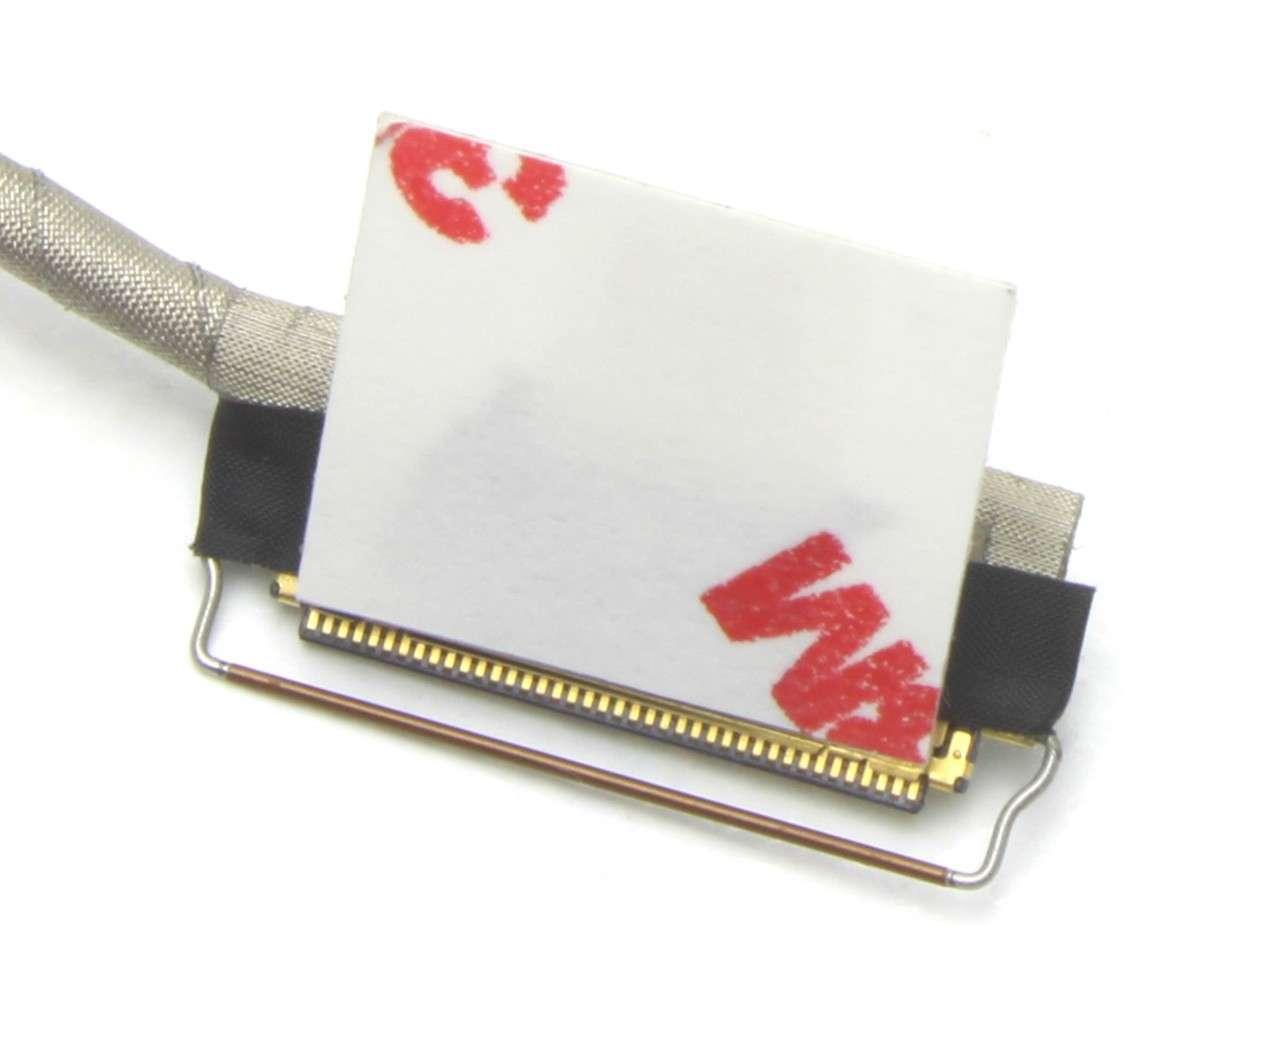 Cablu video eDP Dell DC02002BZ00 40 pini FULL HD 1920x1080 cu touchscreen imagine powerlaptop.ro 2021